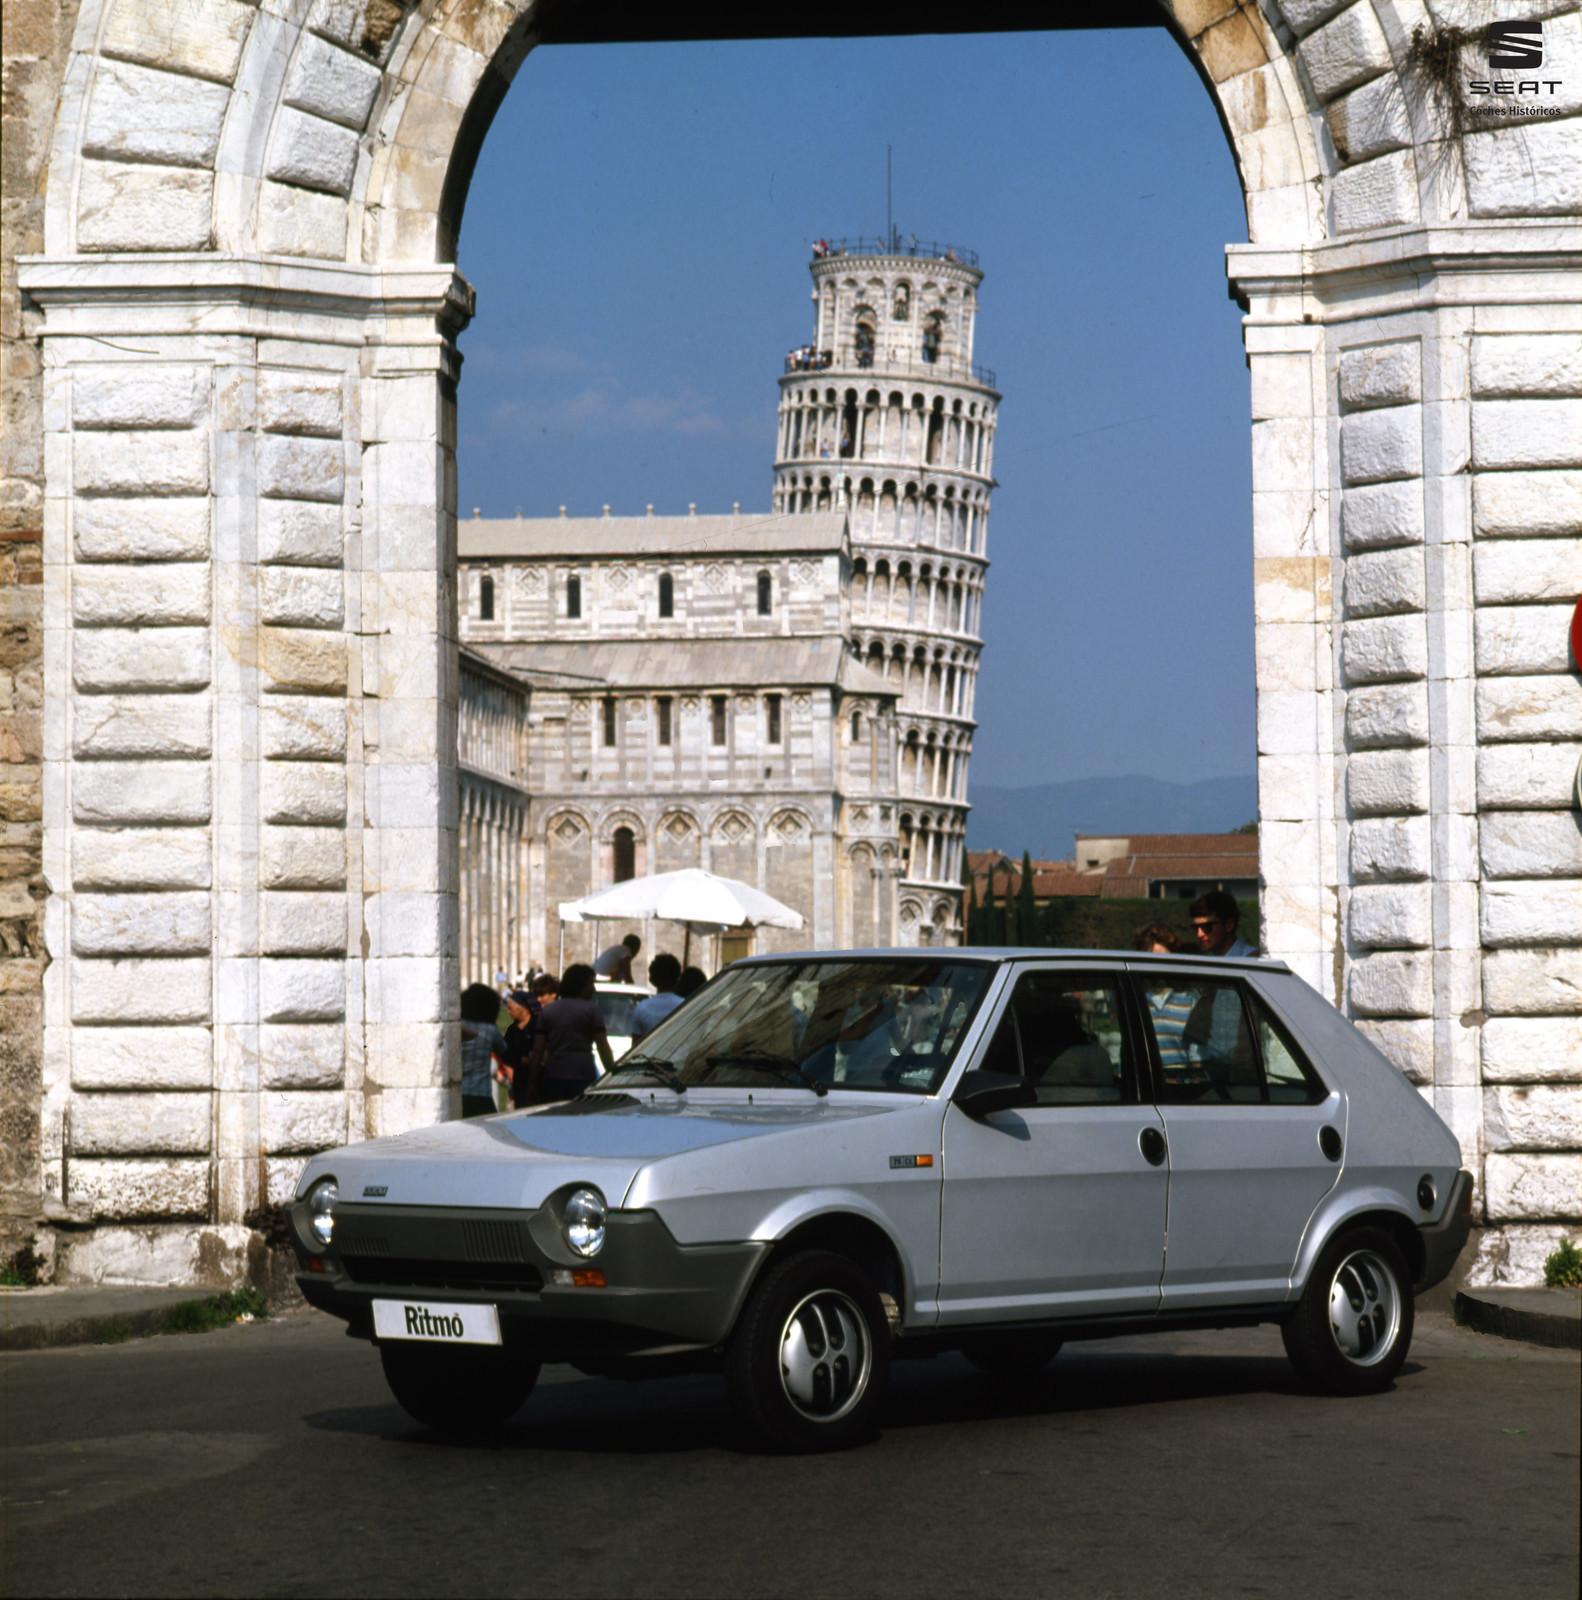 Foto de Motor SEAT 1430 - fotos históricas (35/49)